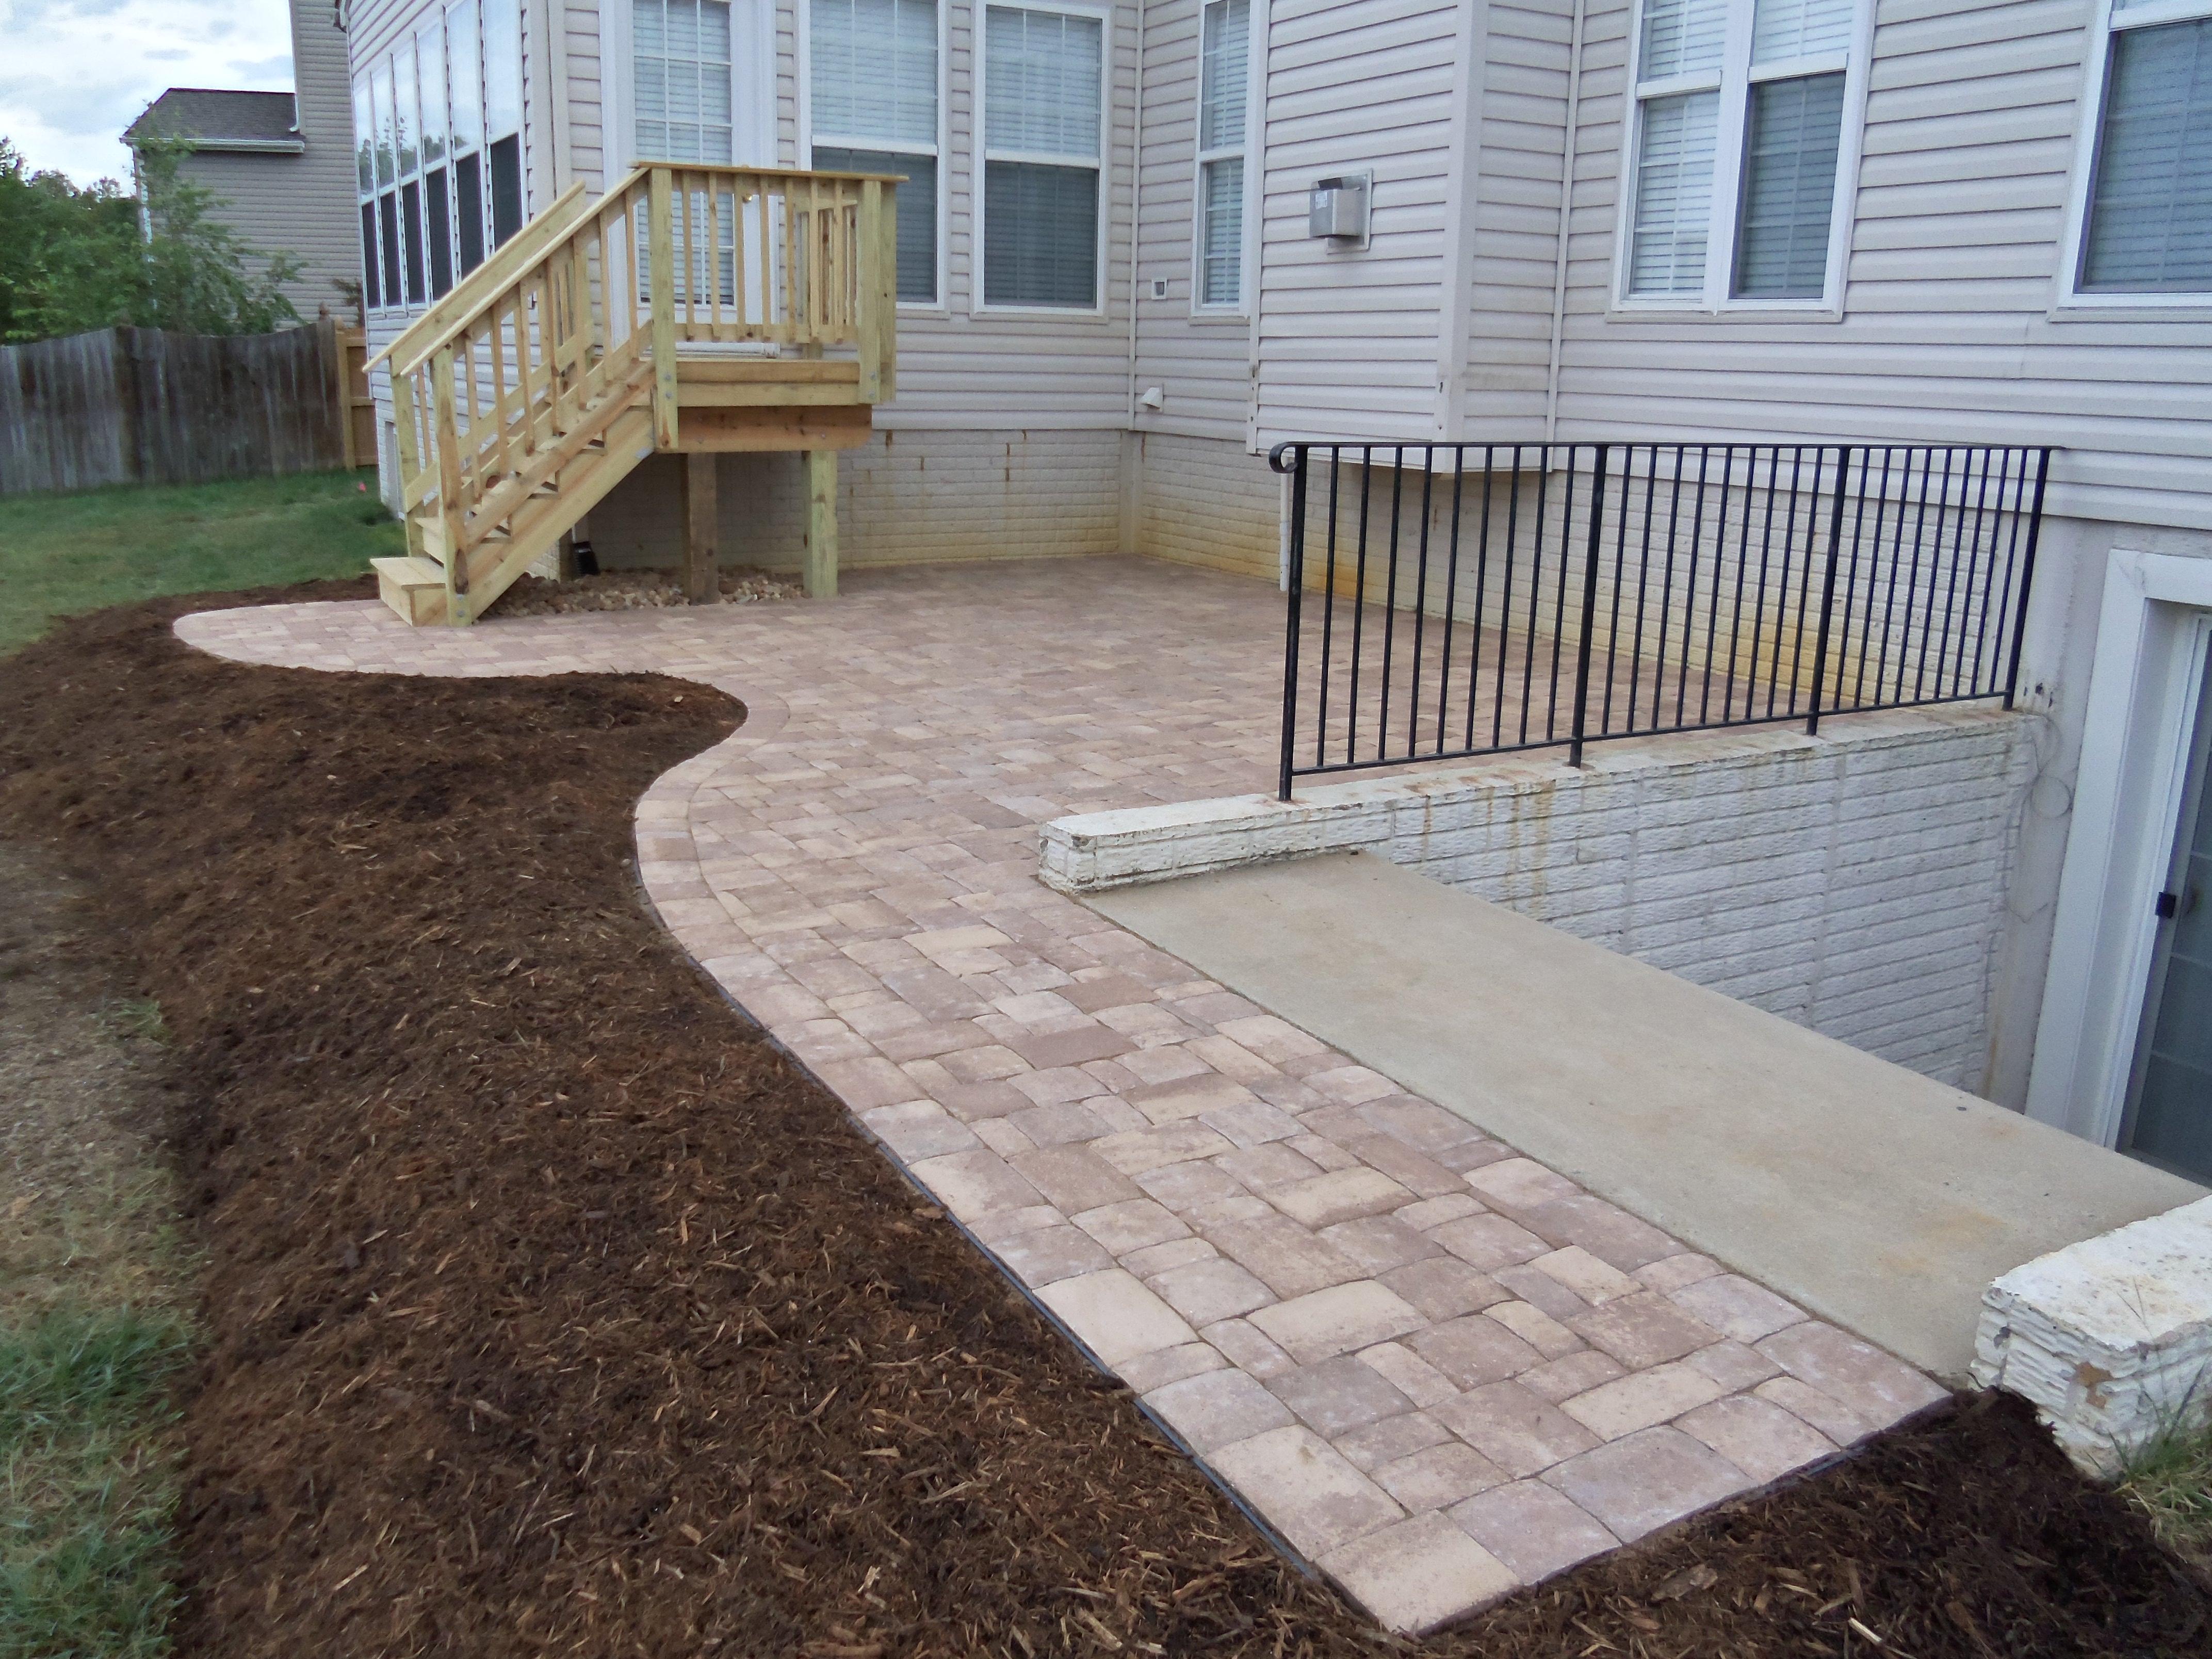 brick paver patio and deck in fredericksburg va | Stafford ... on Brick Paver Patio Designs  id=18409